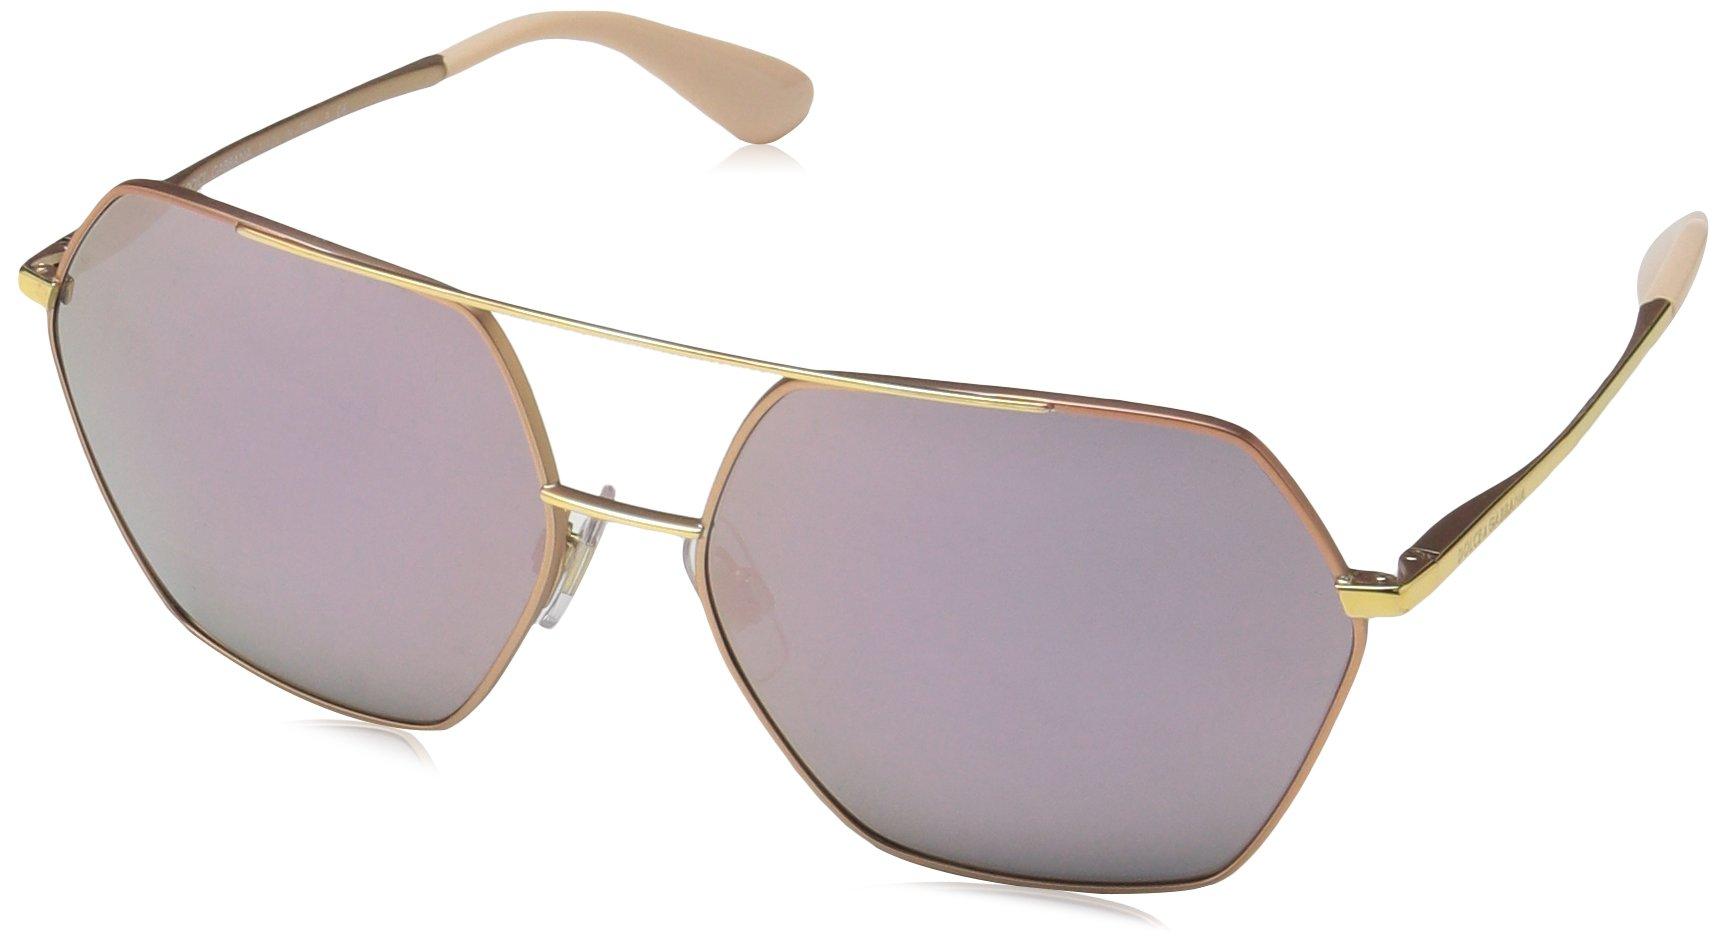 Dolce & Gabbana Women's Metal Woman Non-Polarized Iridium Square Sunglasses, Matte Pink Gold, 59.2 mm